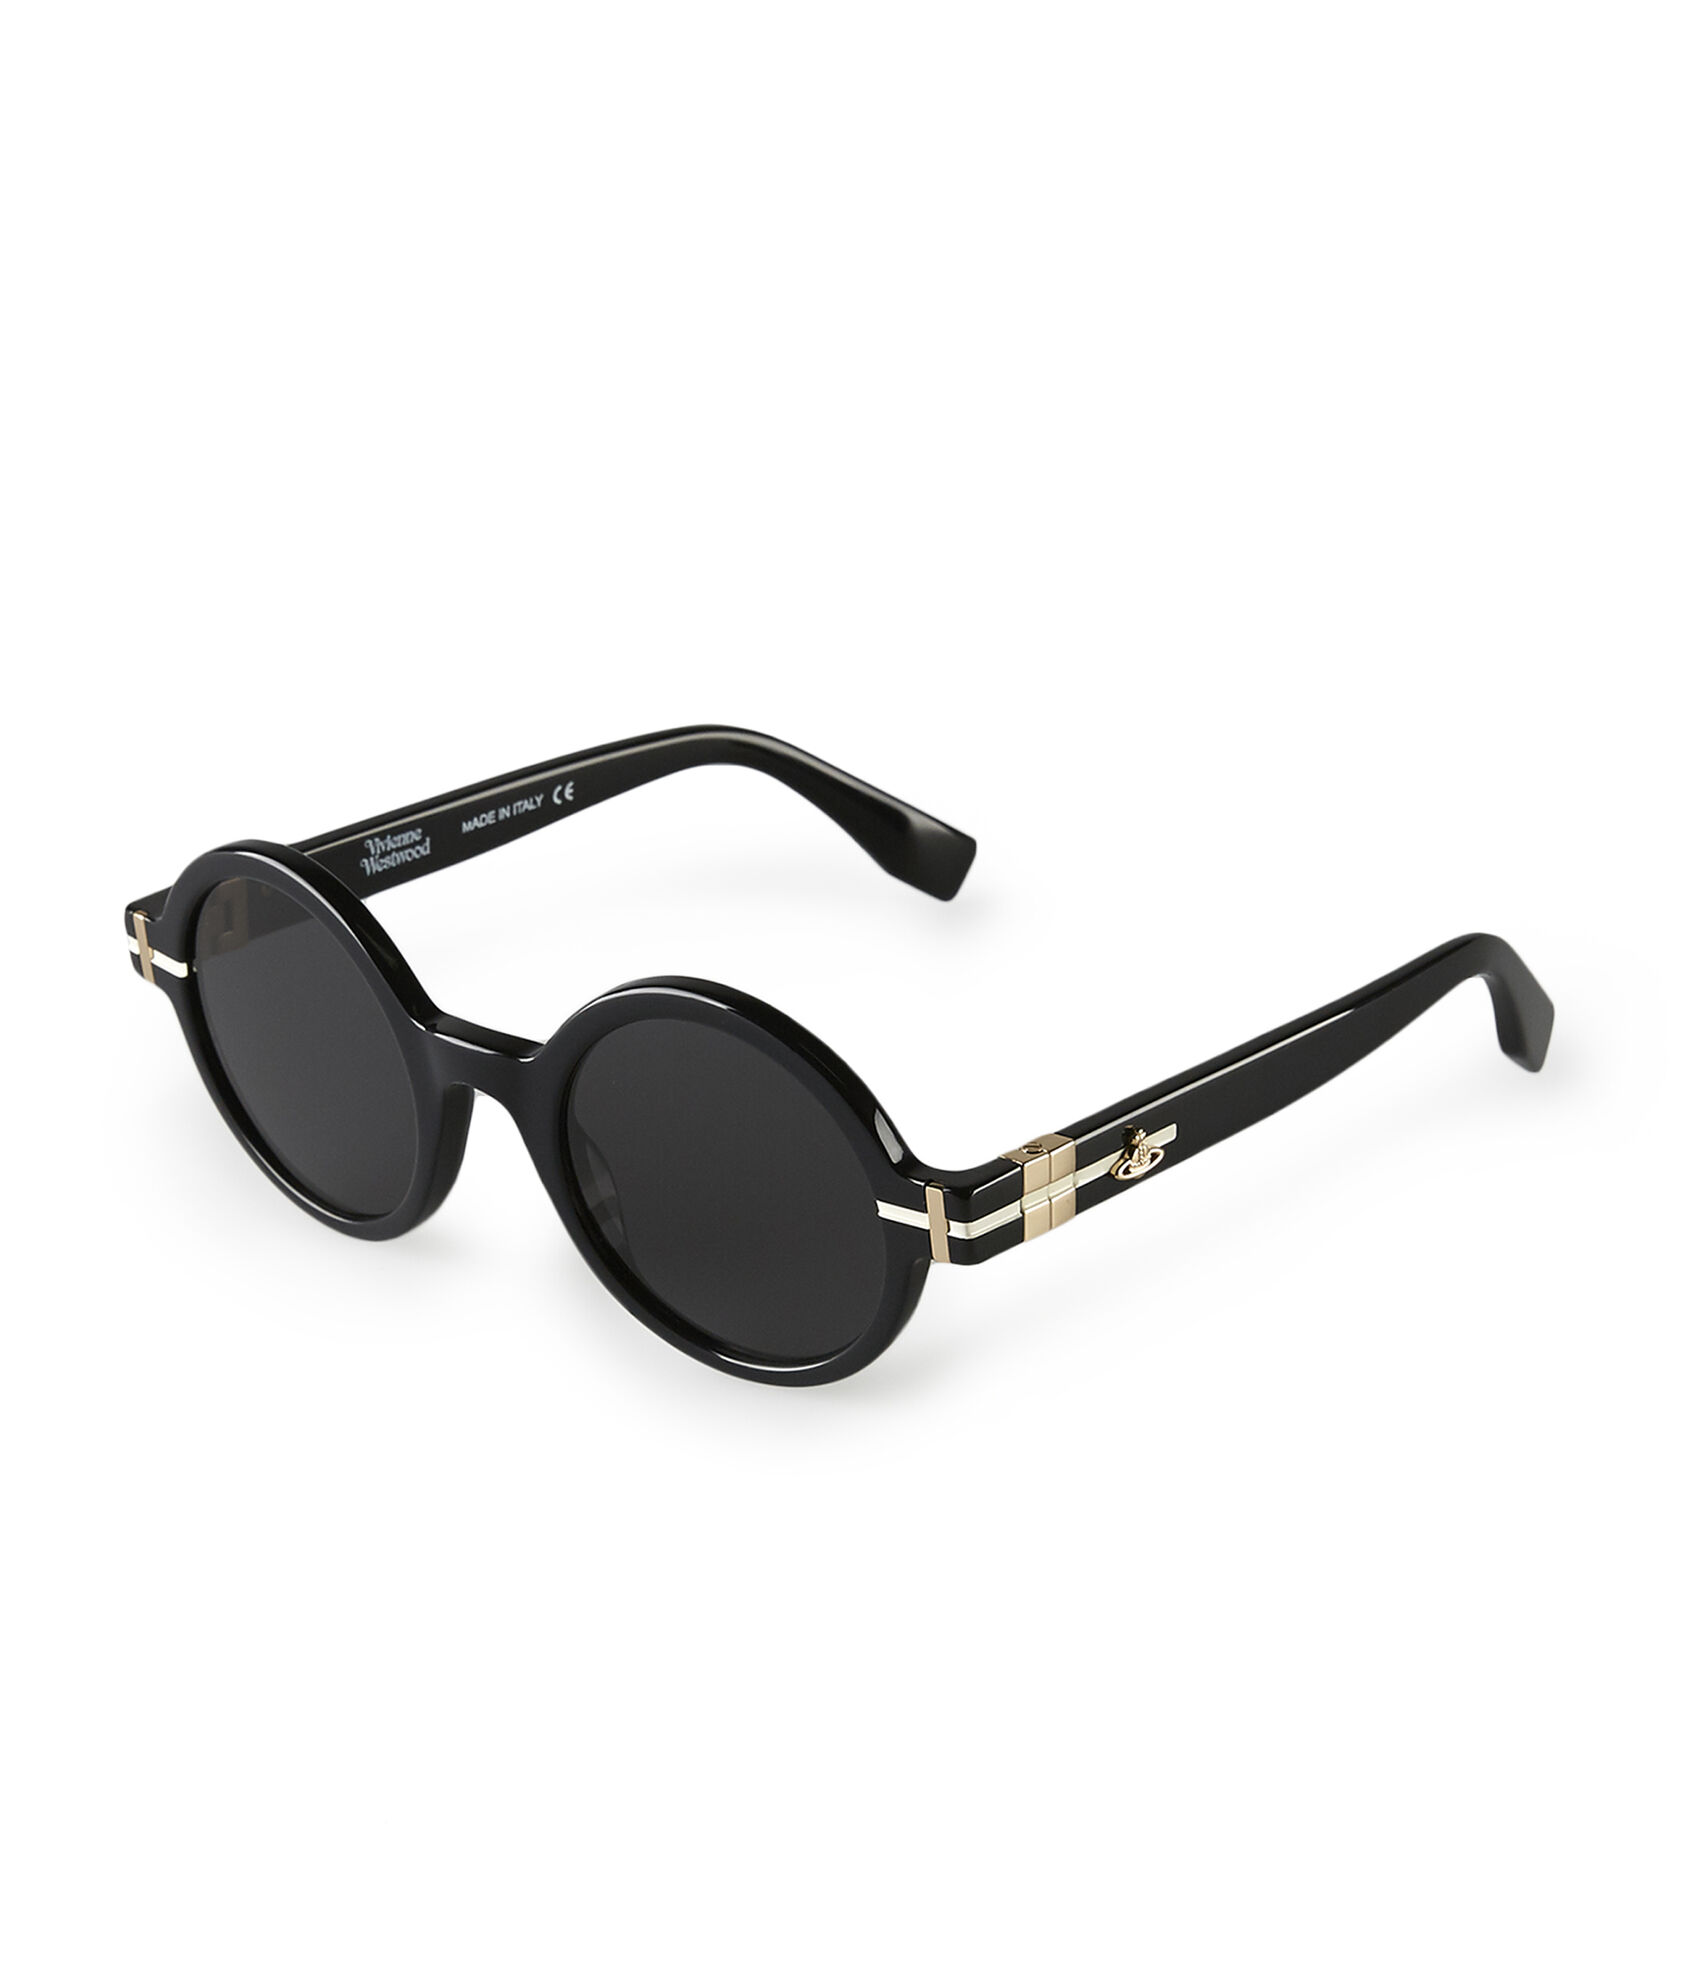 f5309580df Vivienne Westwood Women s Designer Sunglasses